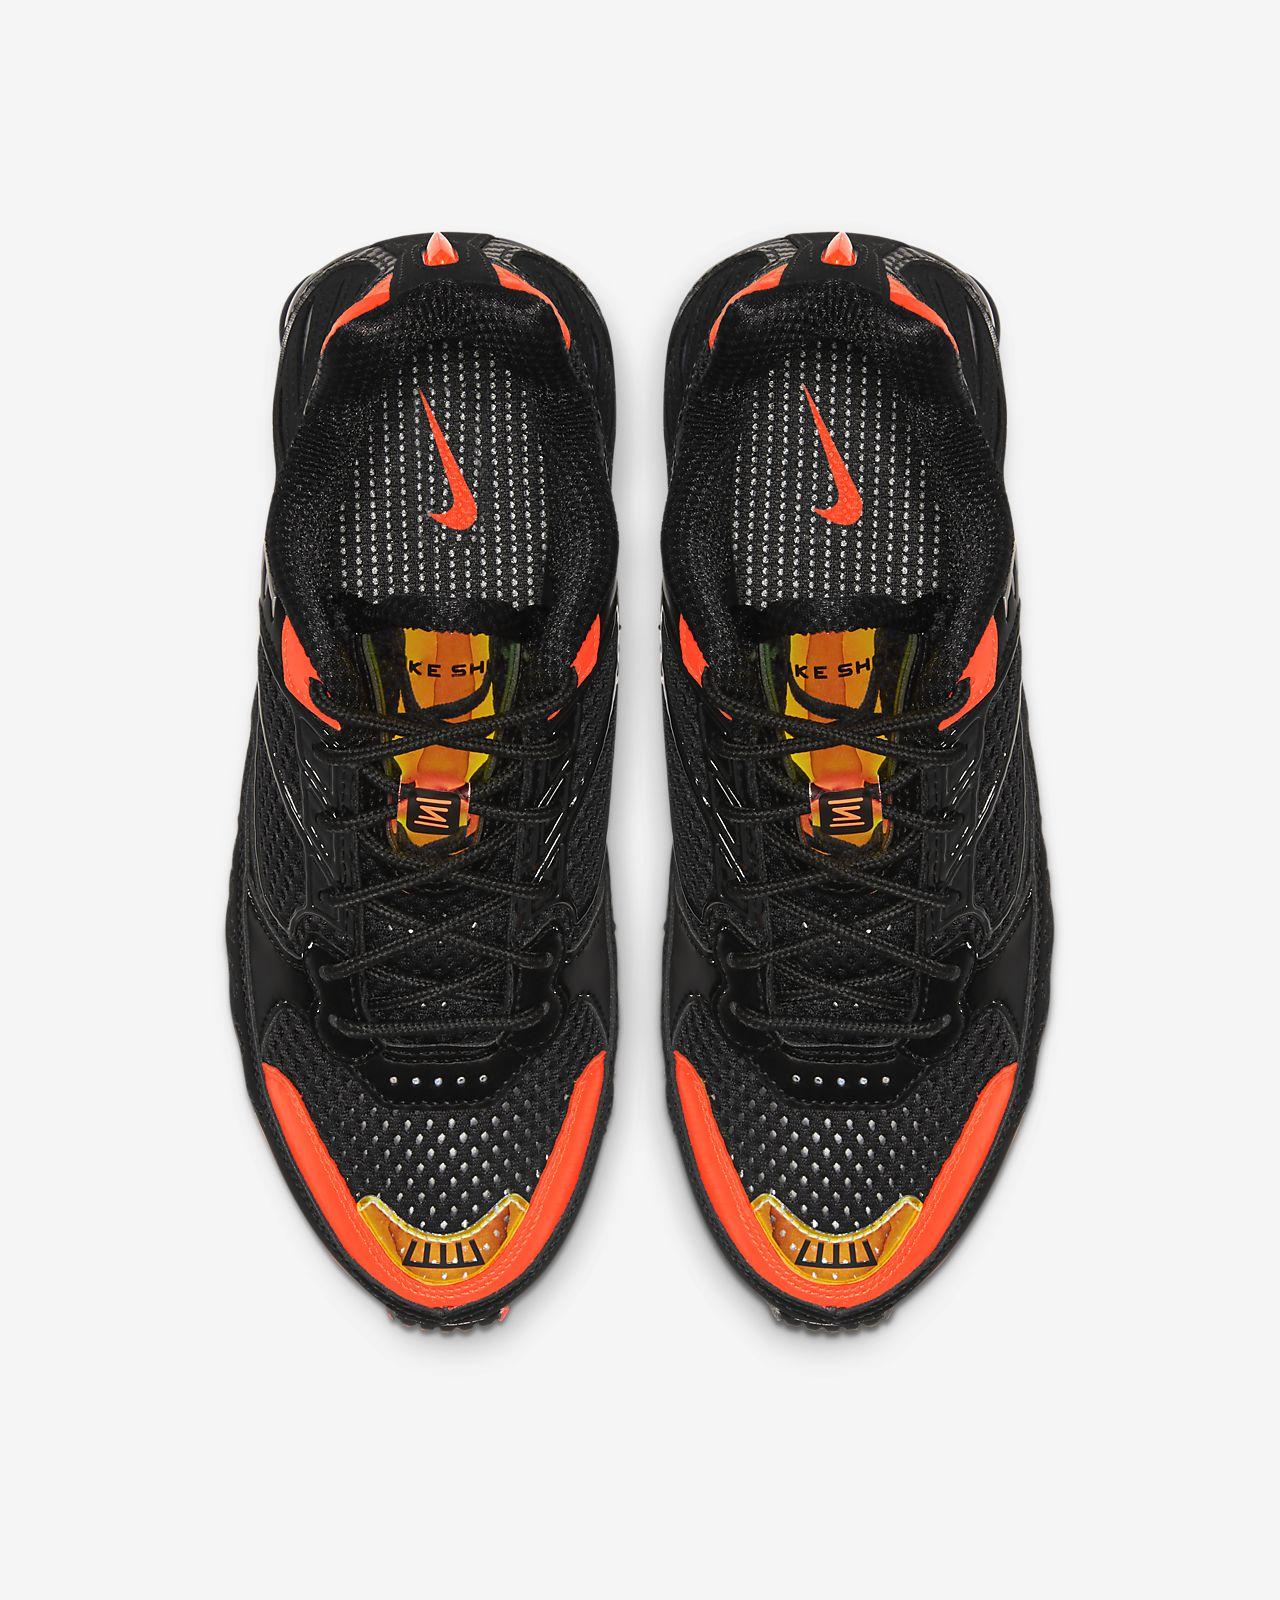 Remember the Nike Shox? Nike brought them back.